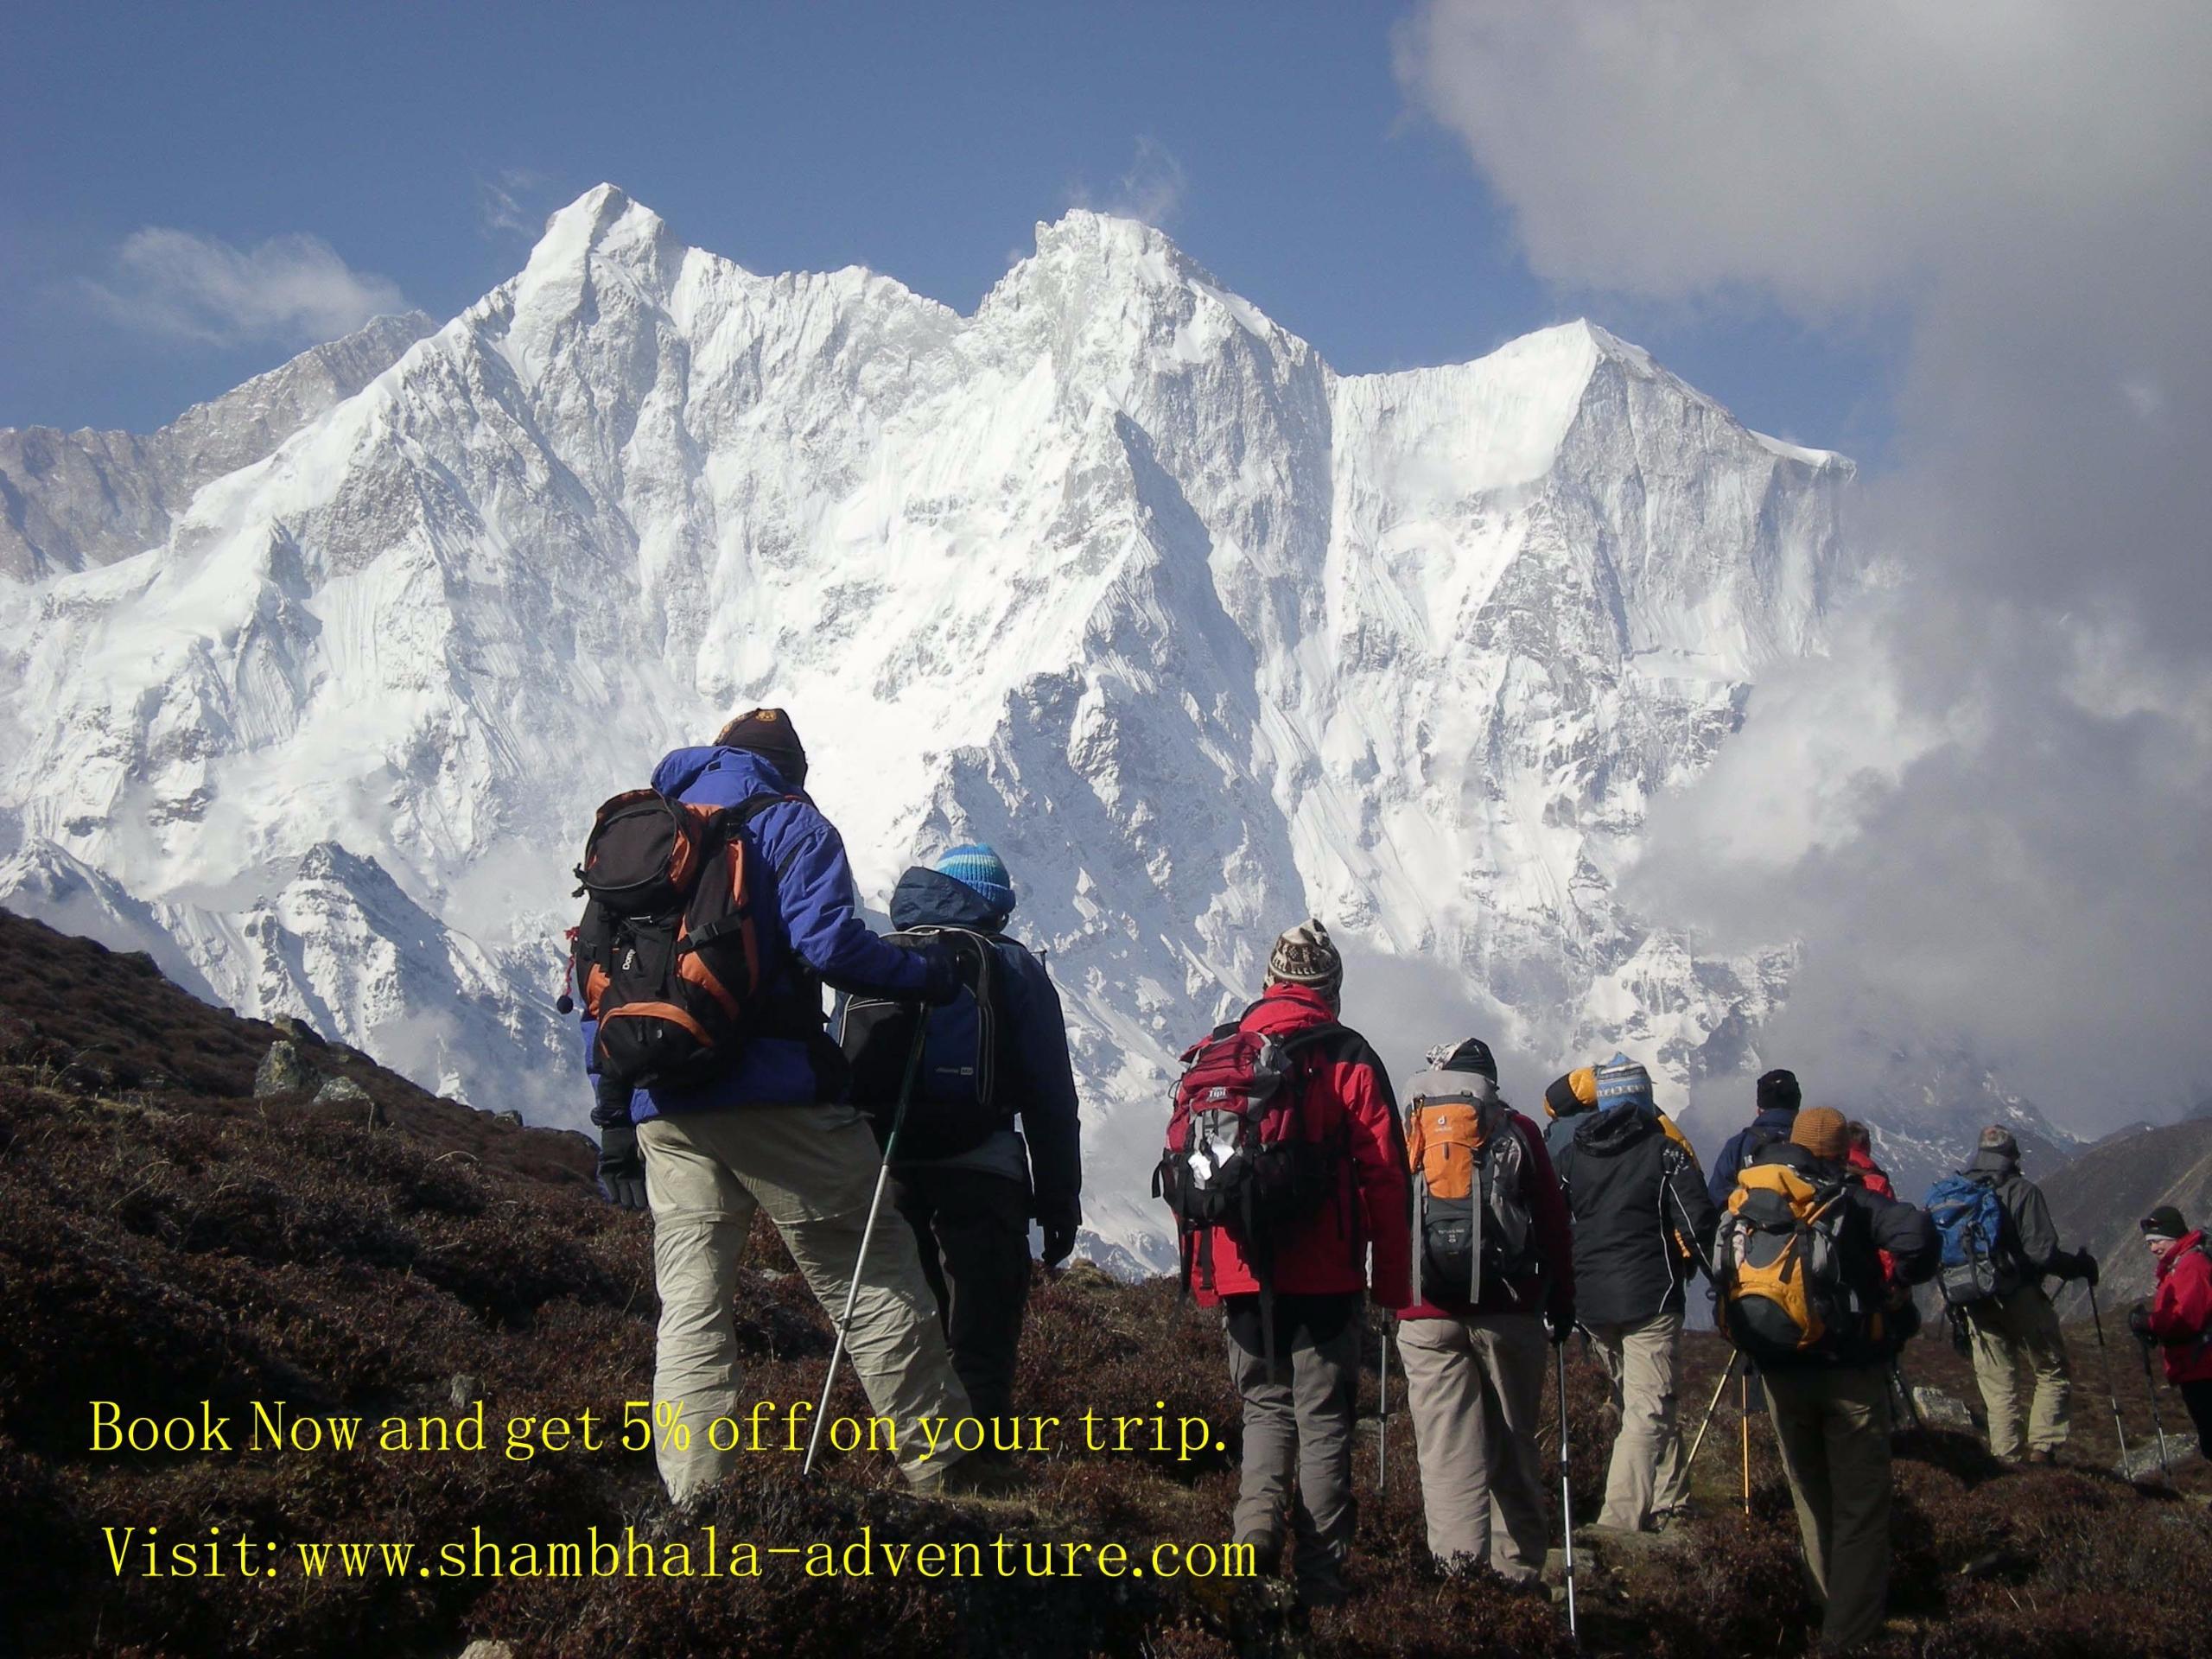 backpacking ready outdoor activ - shambhalaadventure | ello